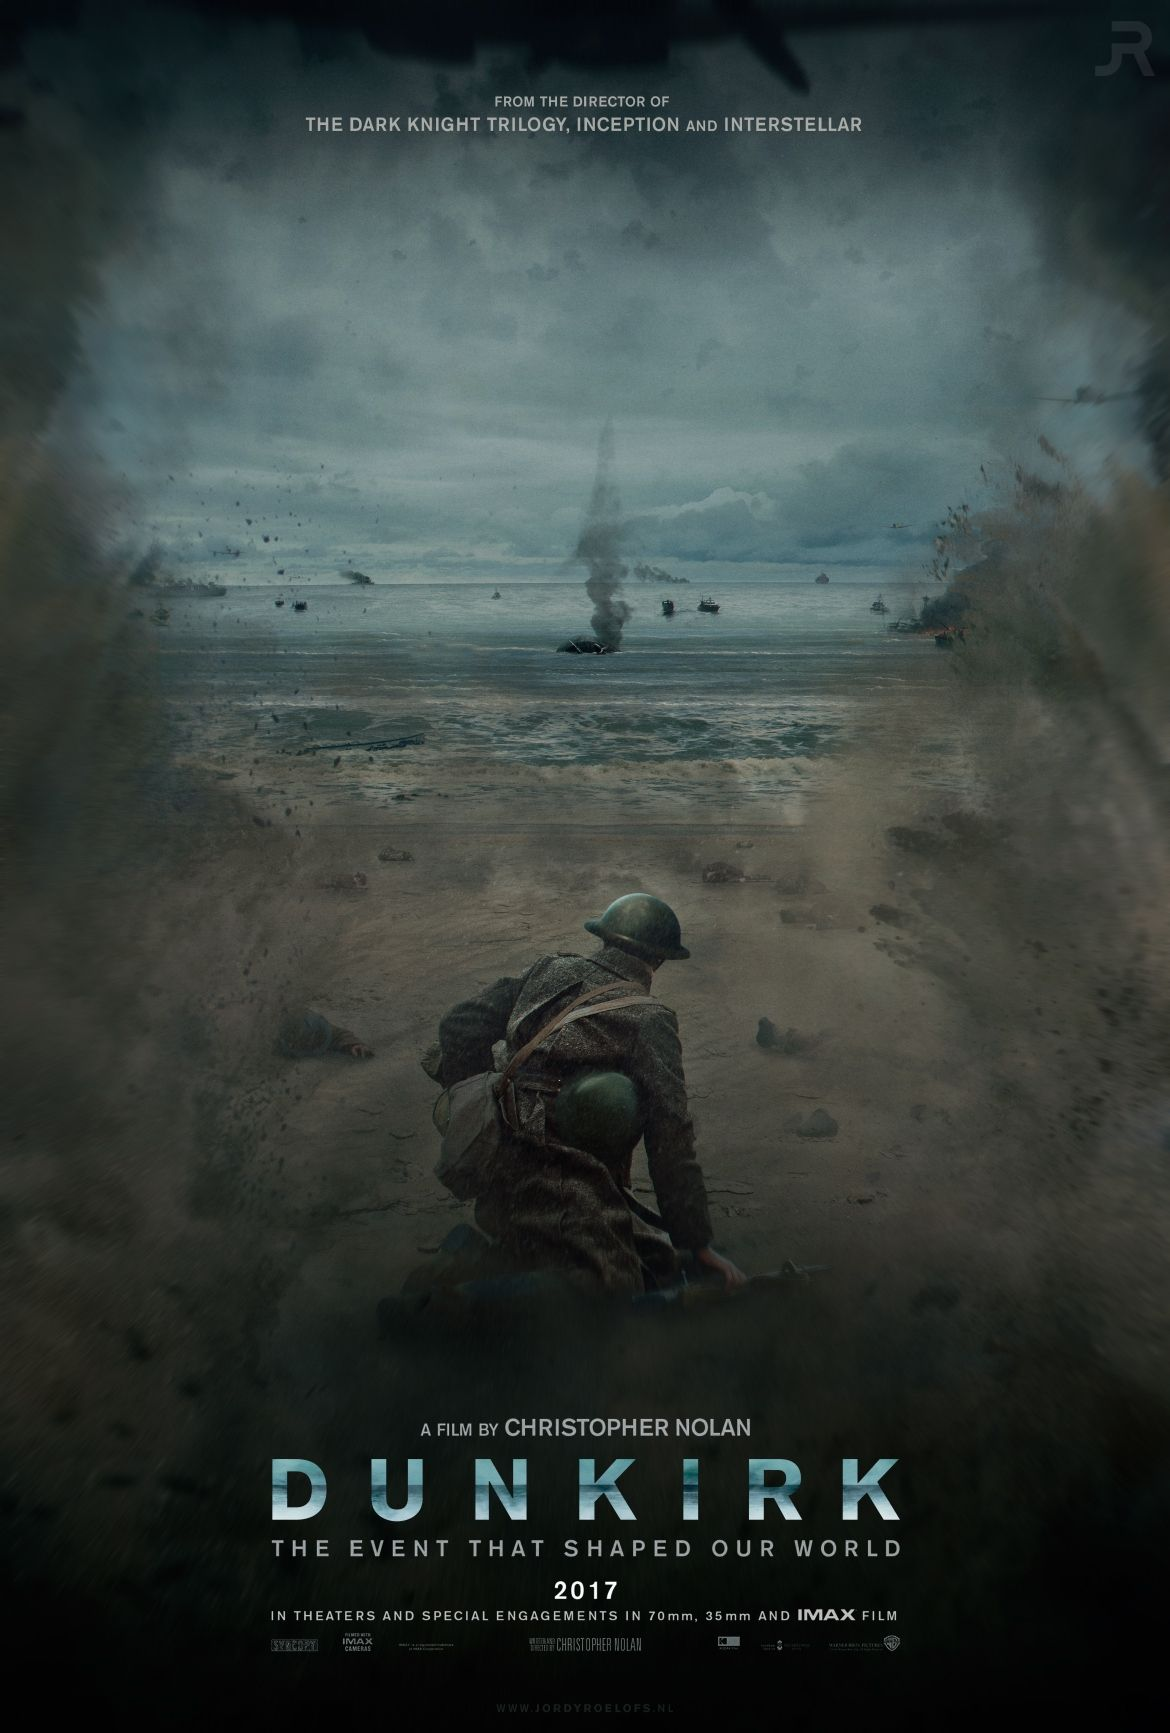 Dunkirk 2017 Dunkirk Dunkirk Movie English Movies